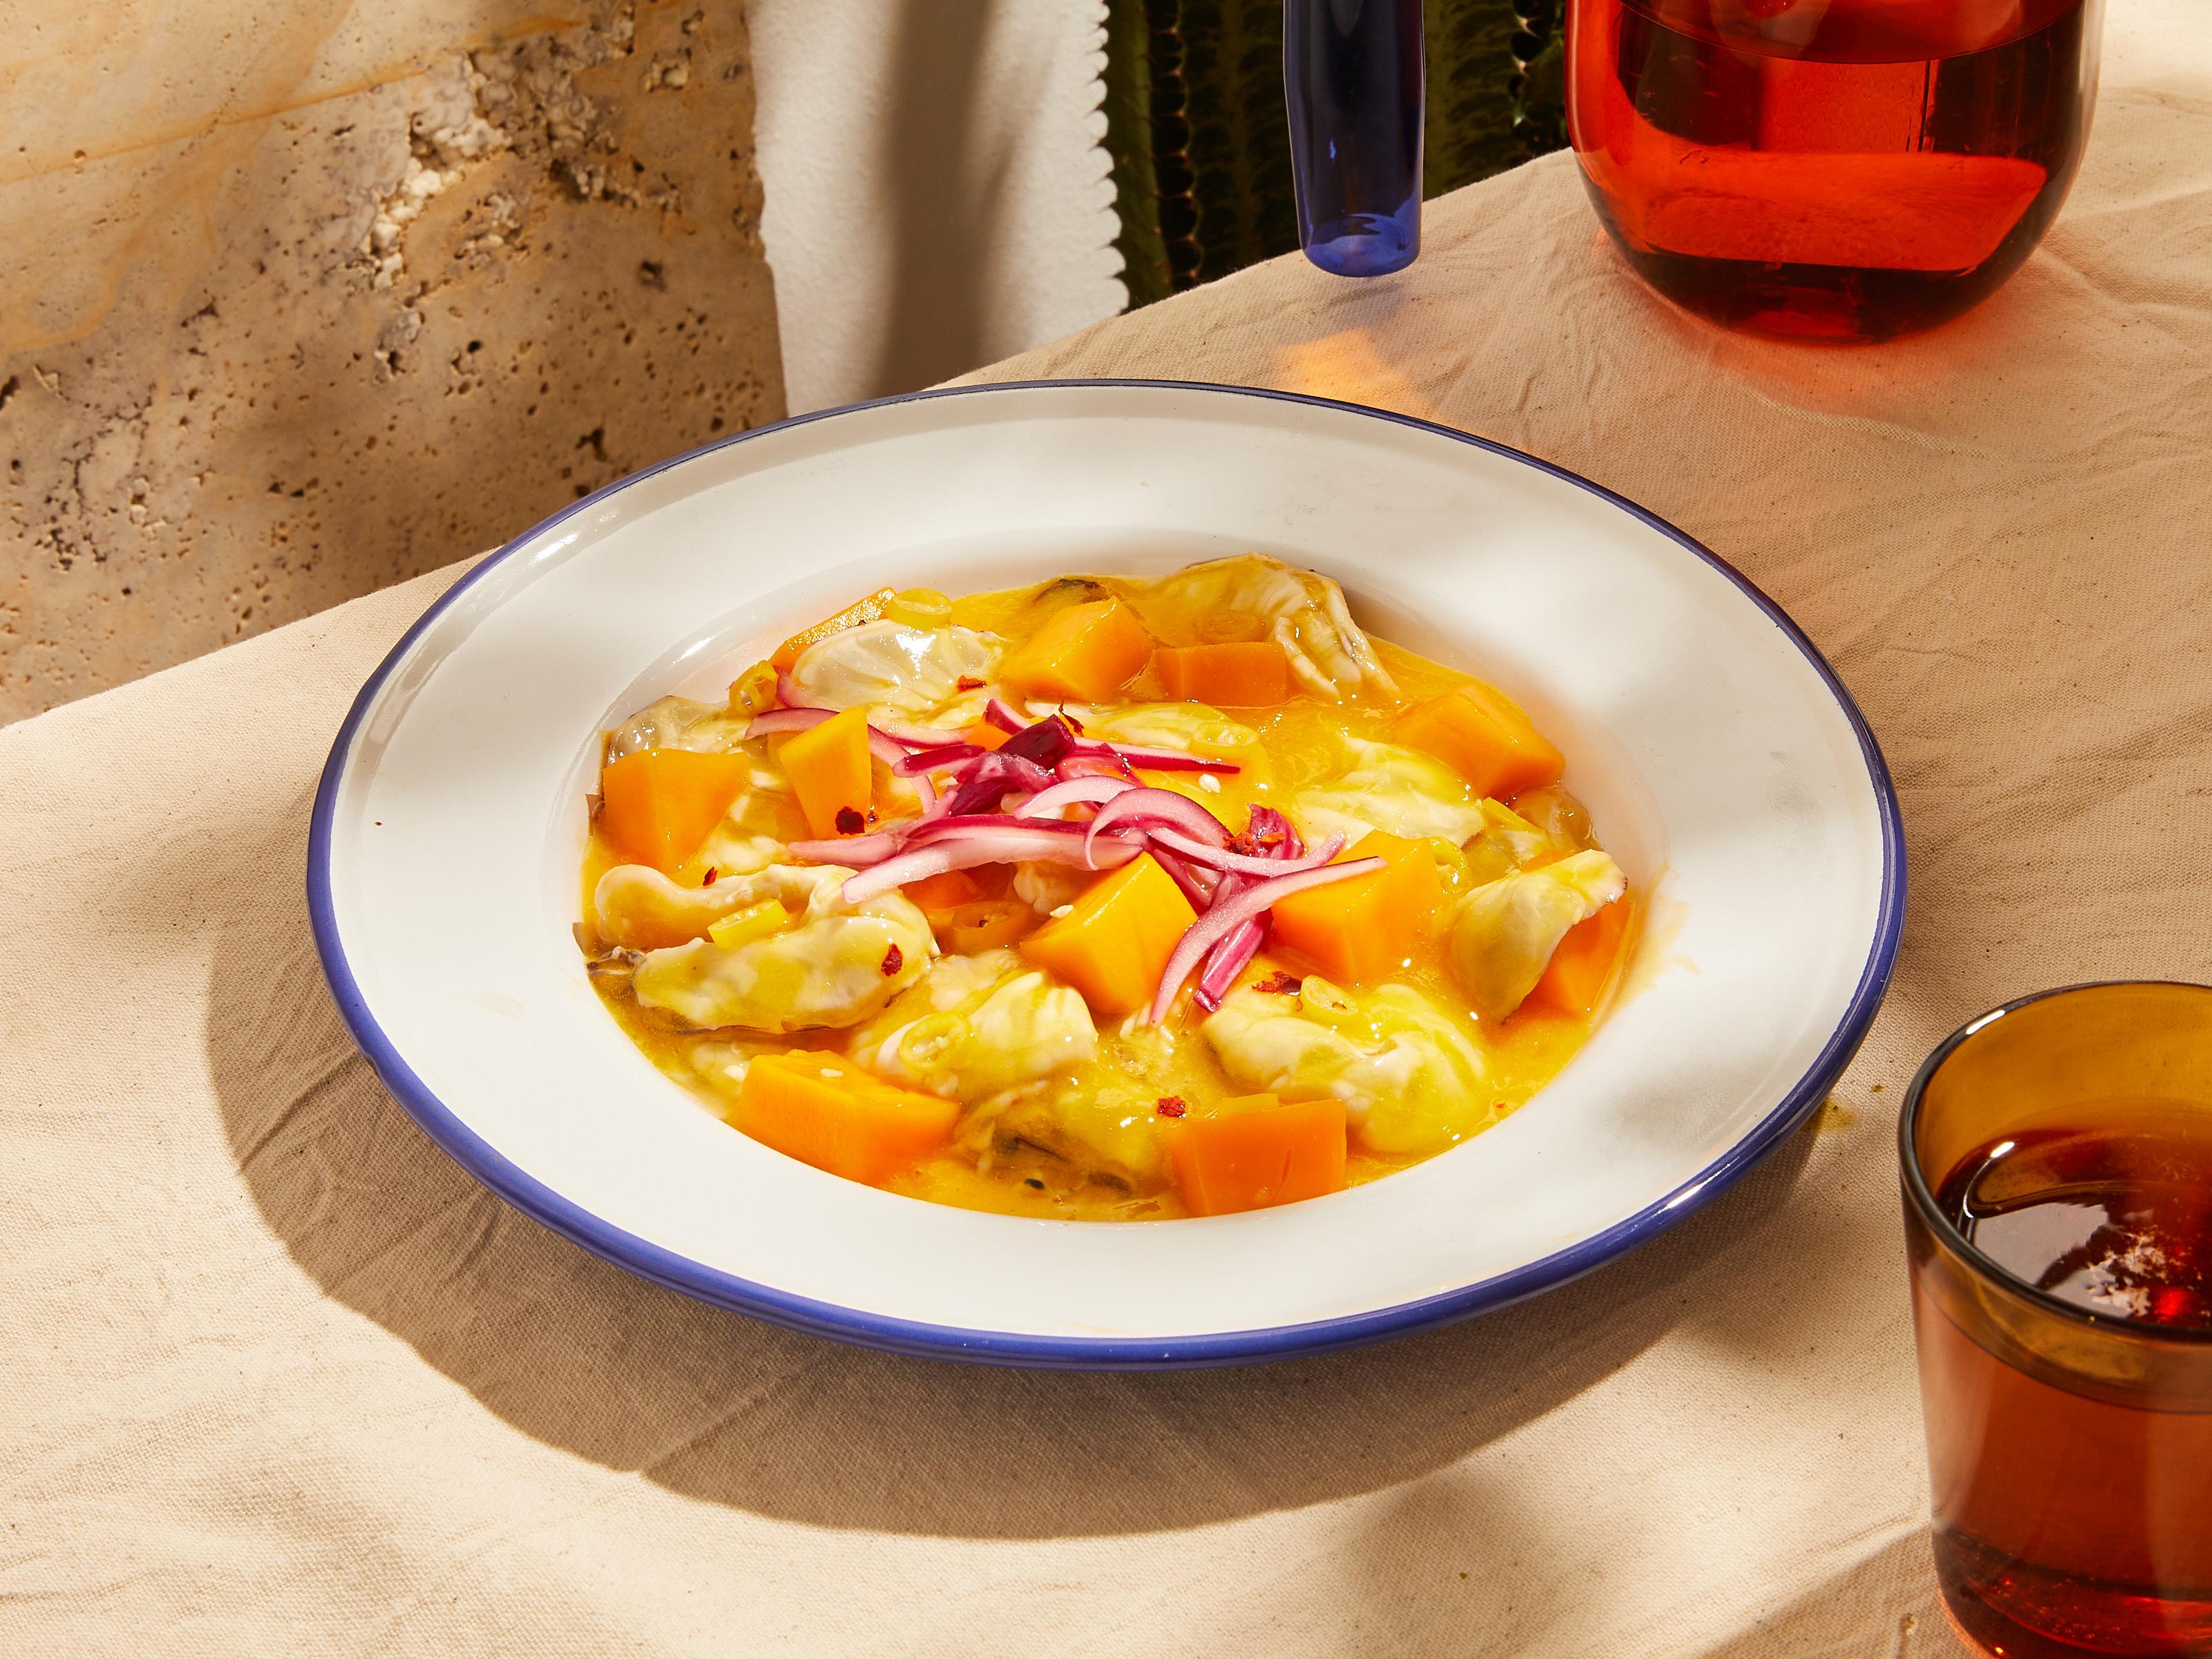 Mango and shrimp aguachile (Mexican ceviche)